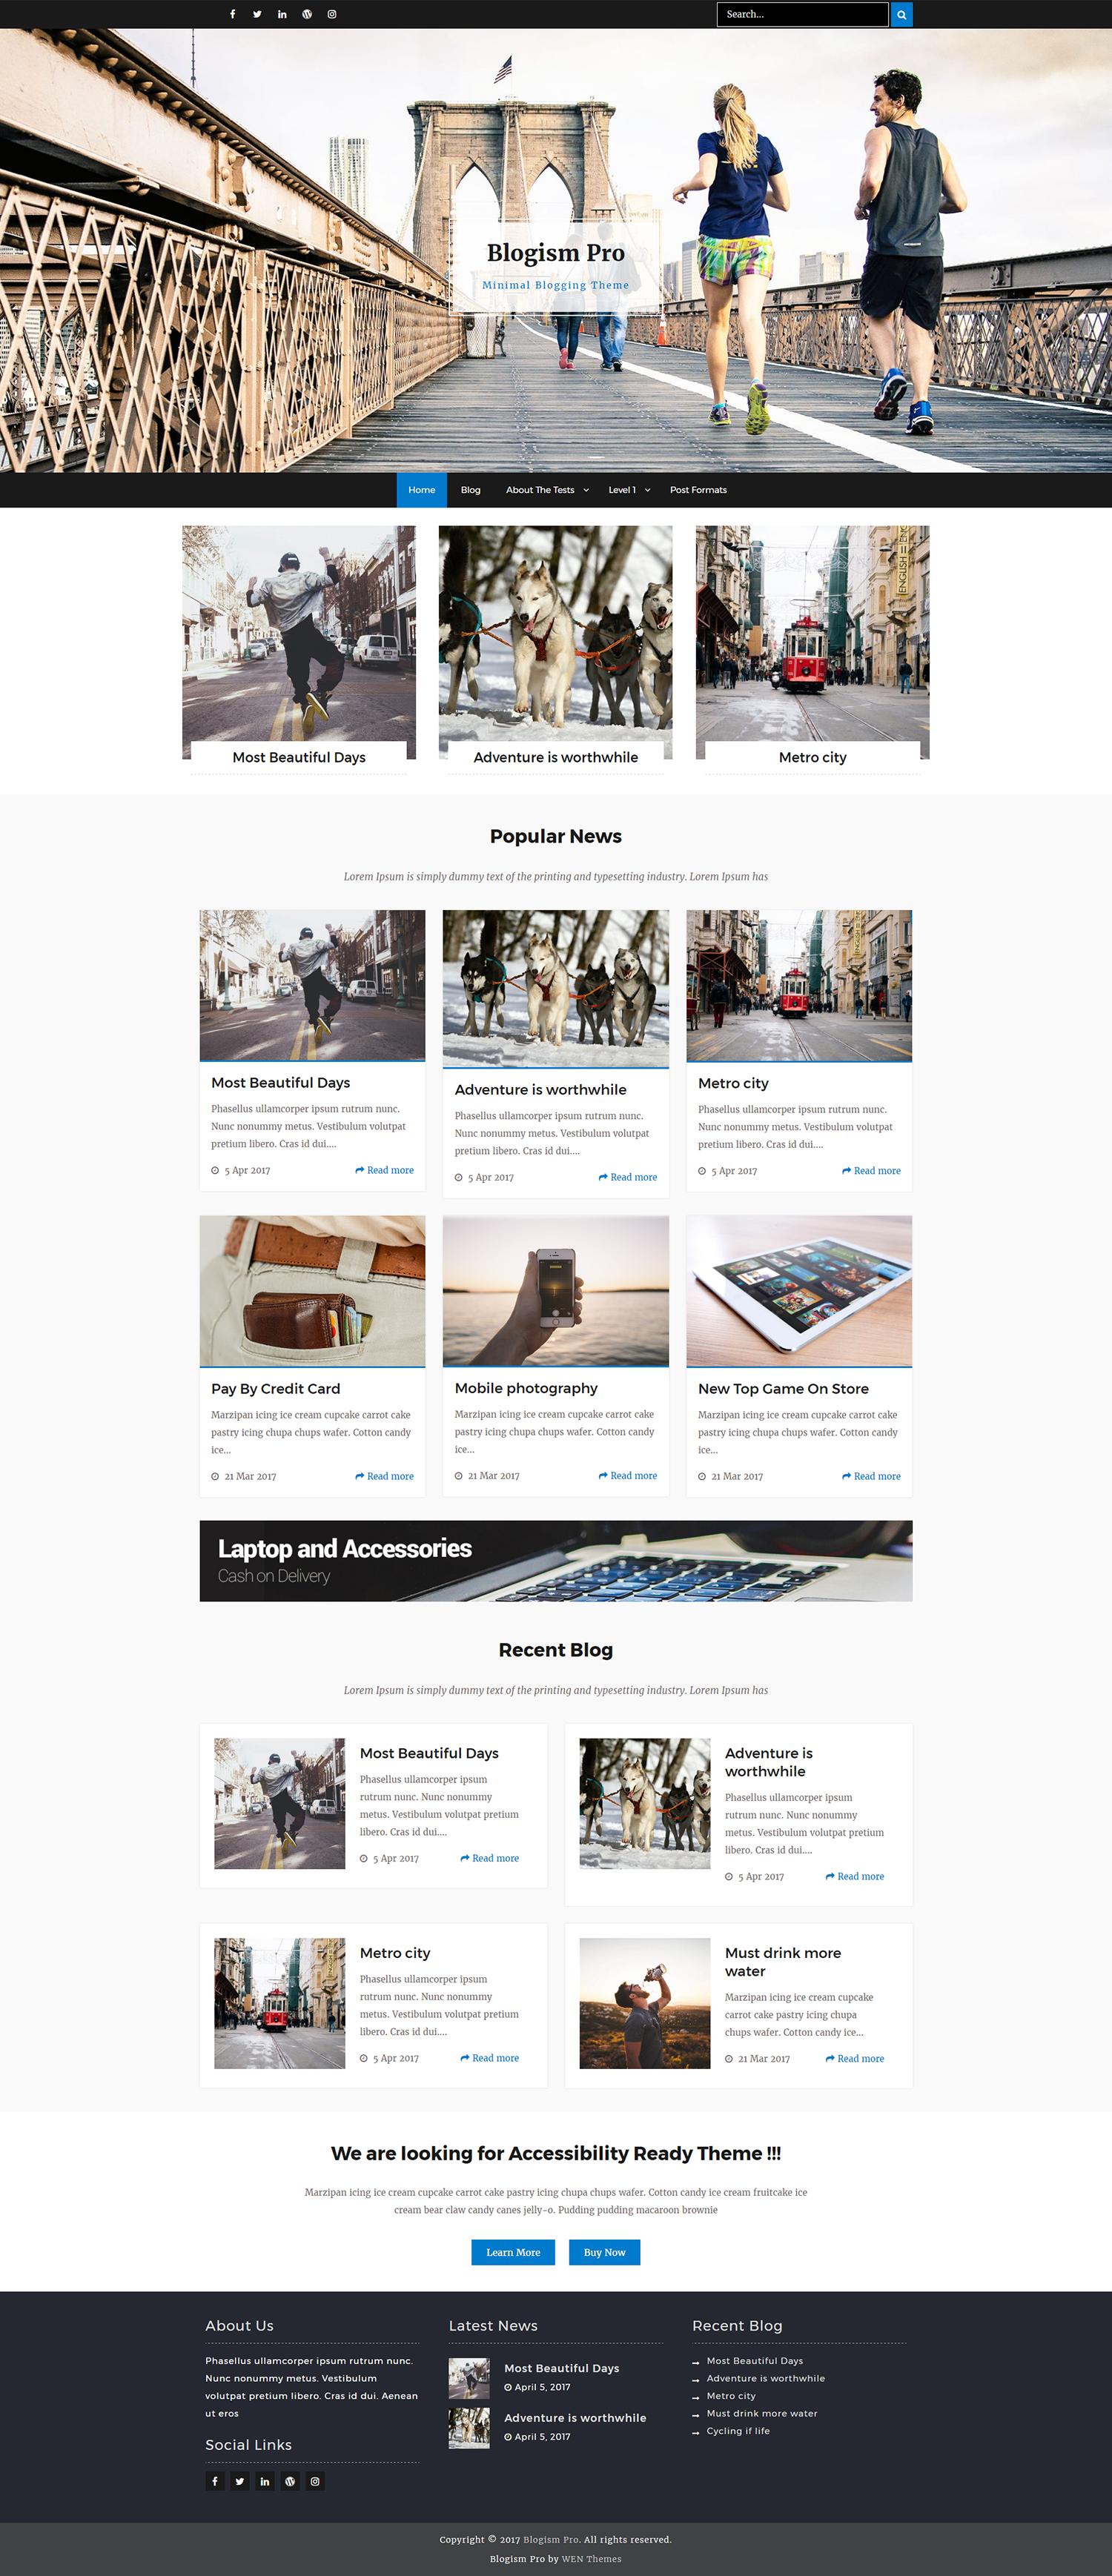 Blogism Pro